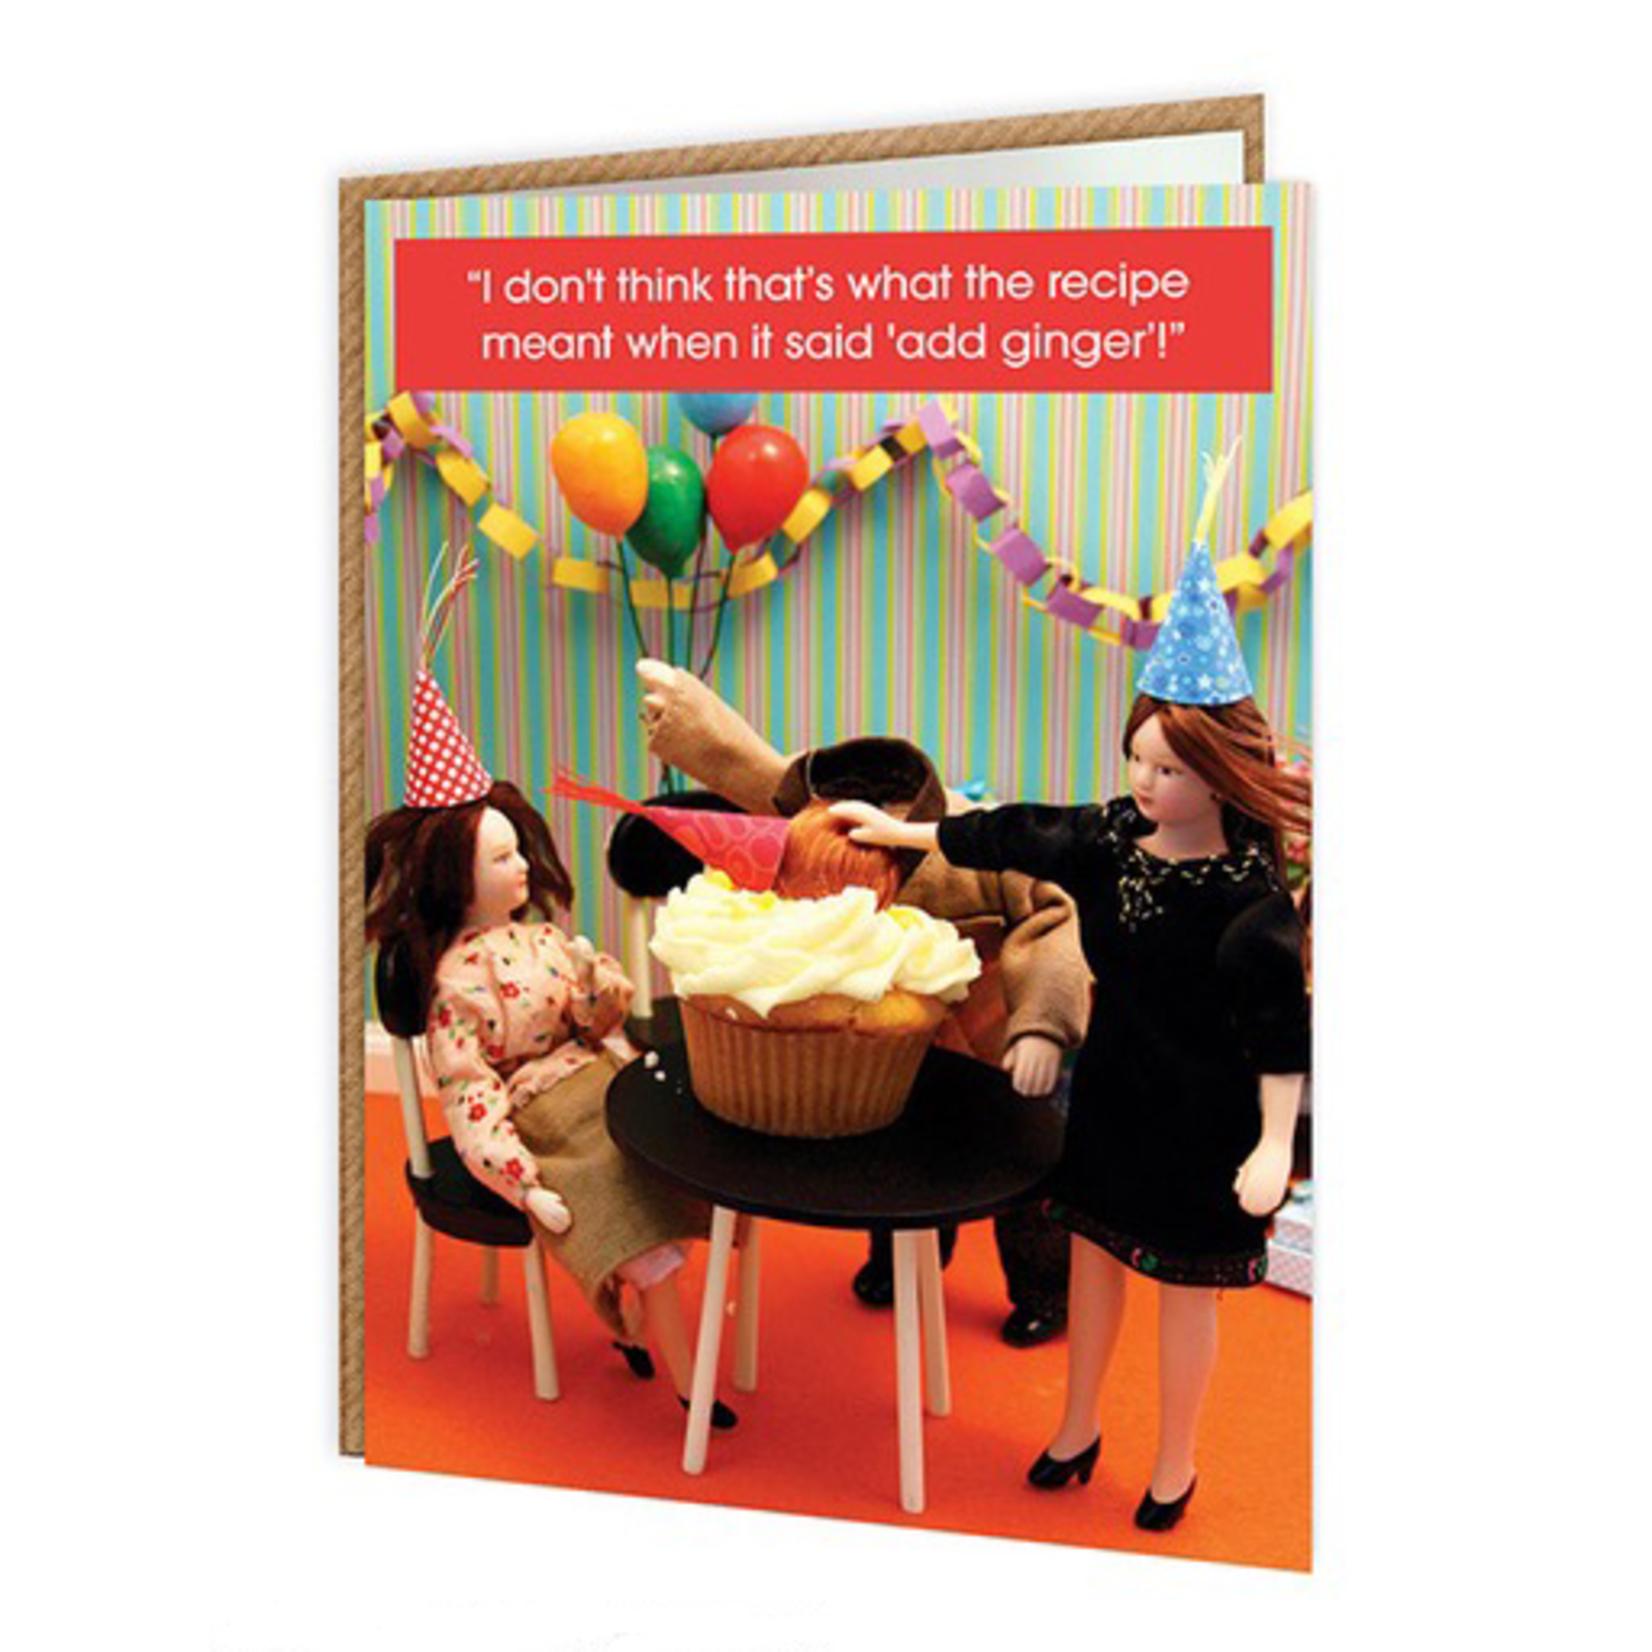 Brainbox Candy Ginger Cake Card - Add Ginger Recipe